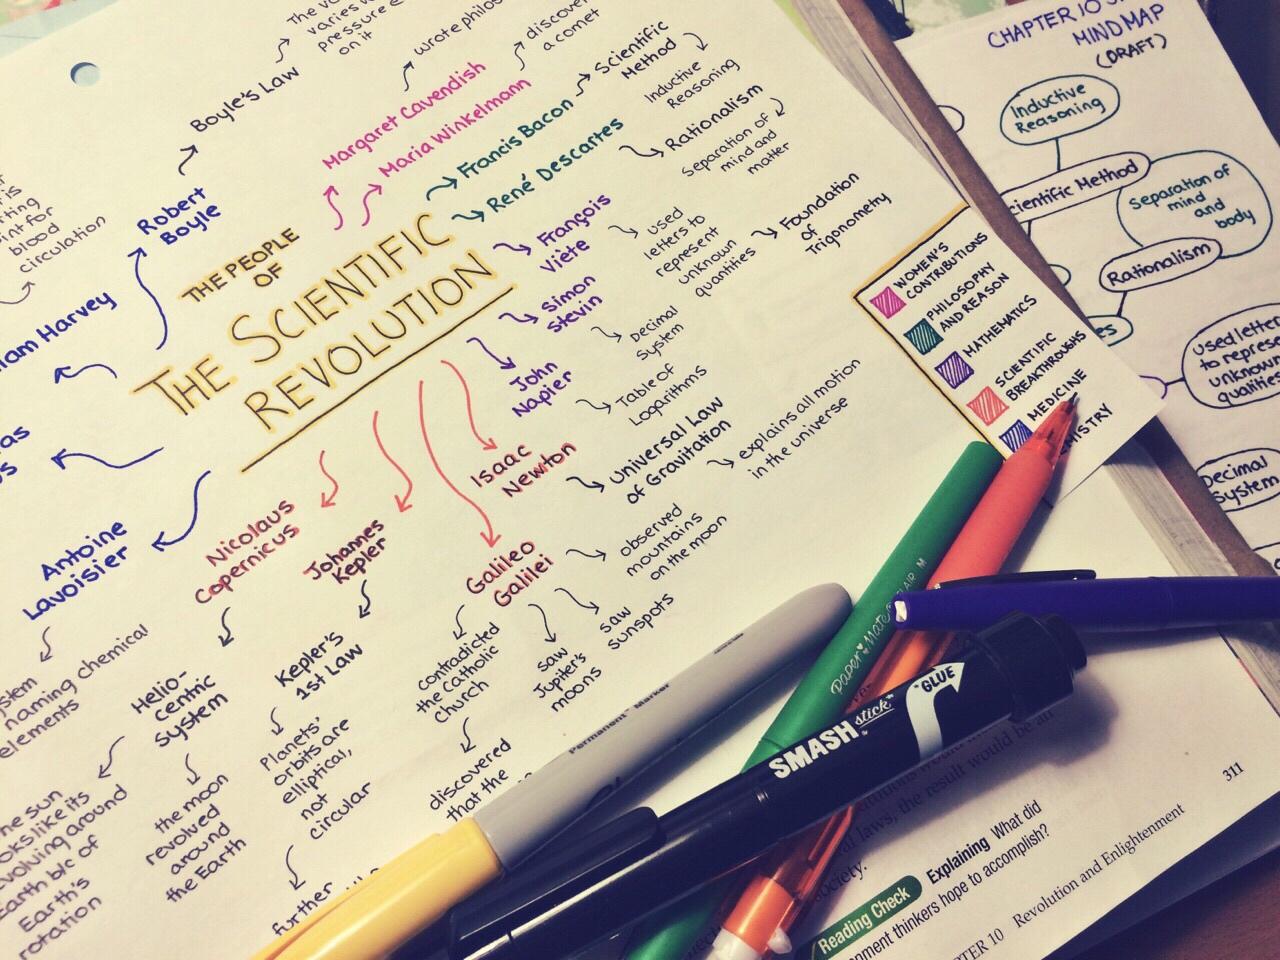 Structuring scientific thinking